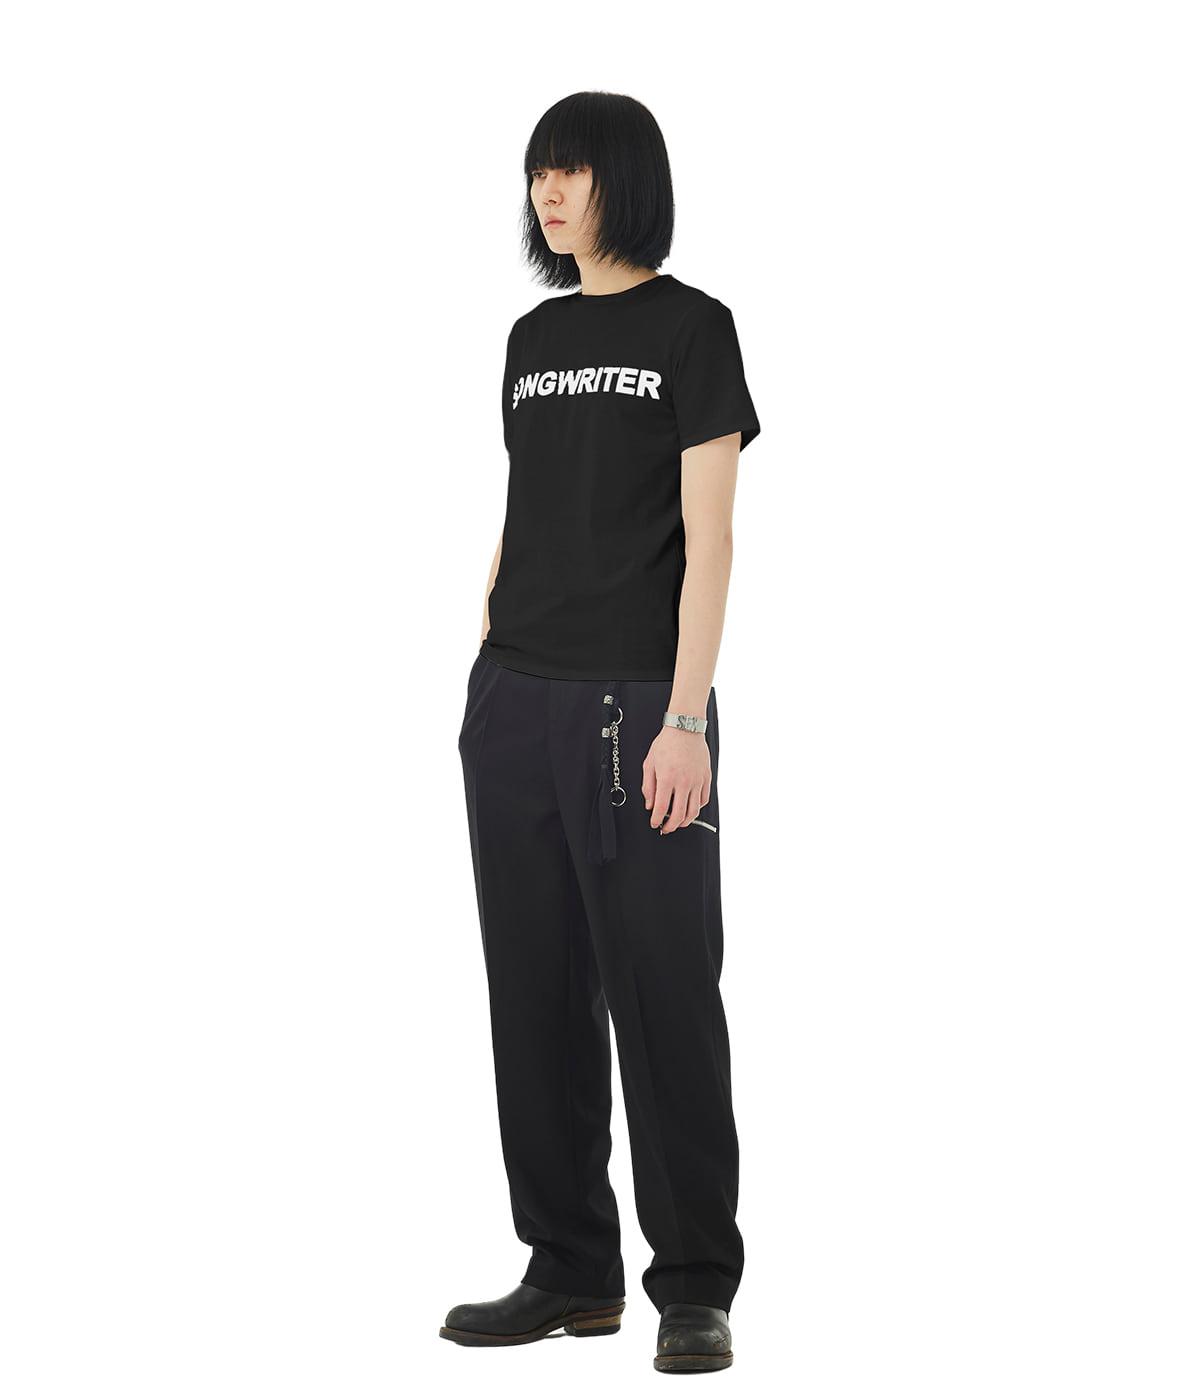 Songwriter T-shirts (Black)